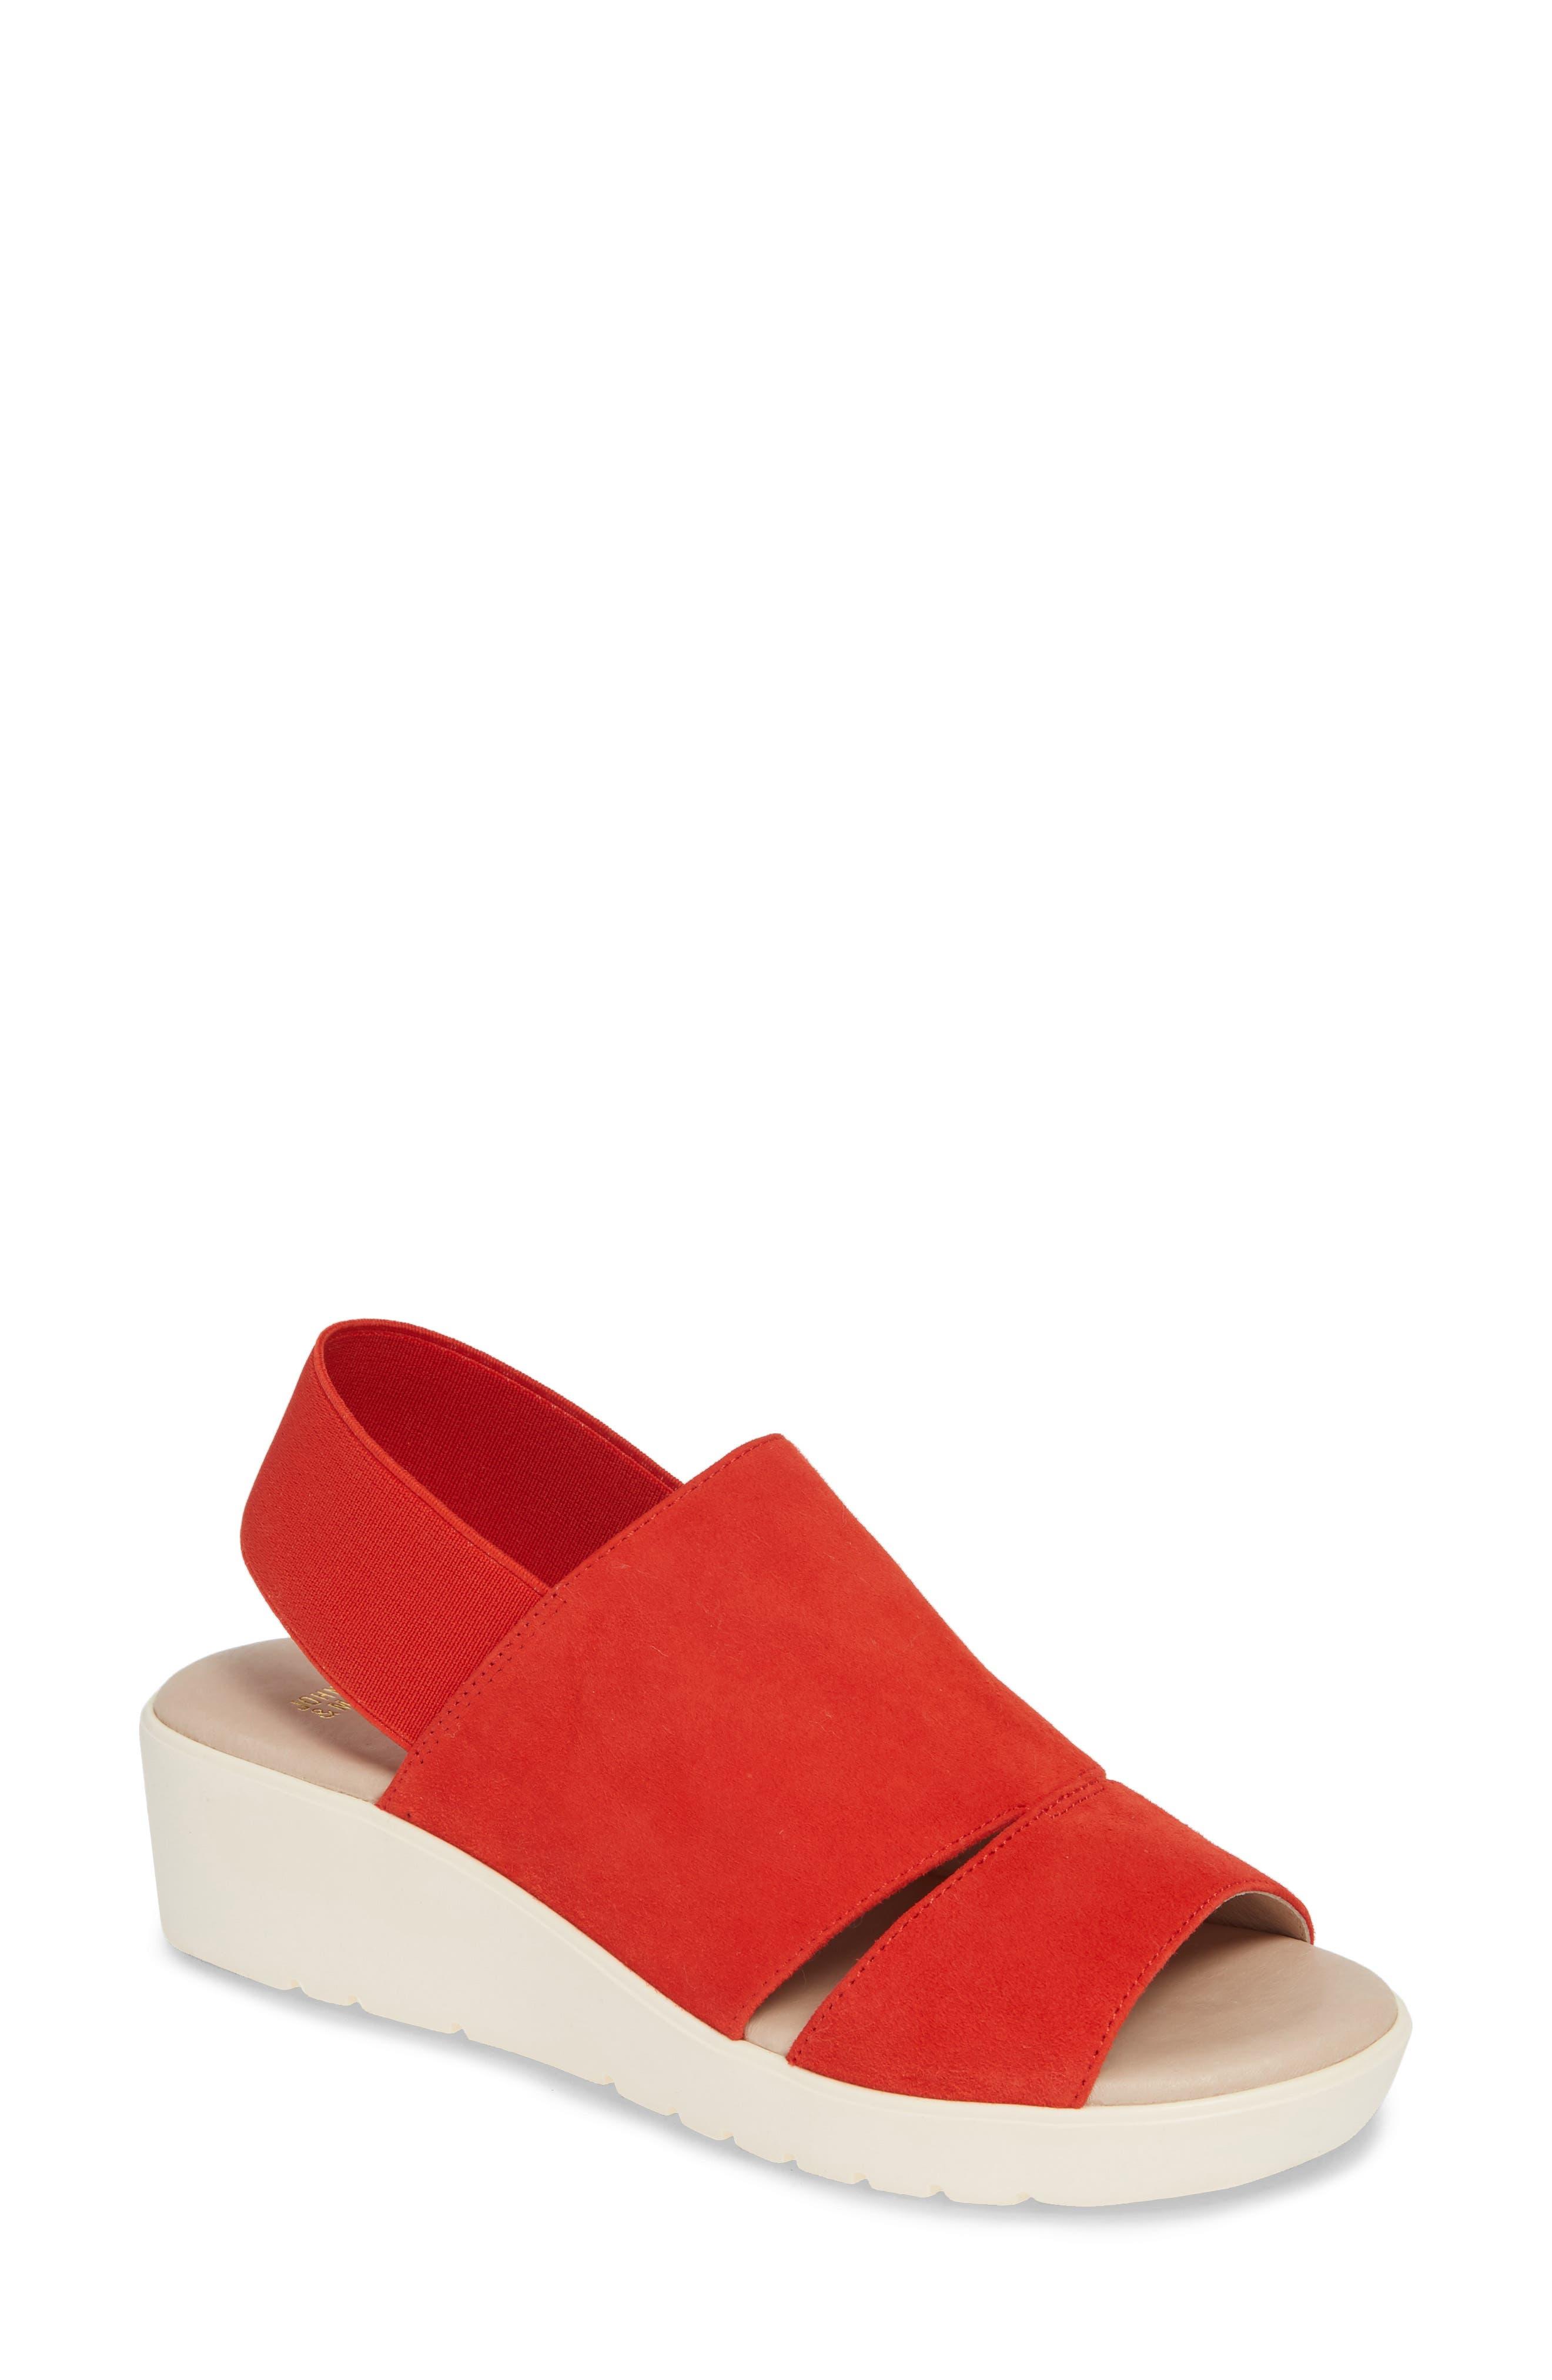 Johnston & Murphy Cassandra Slingback Platform Sandal, Red